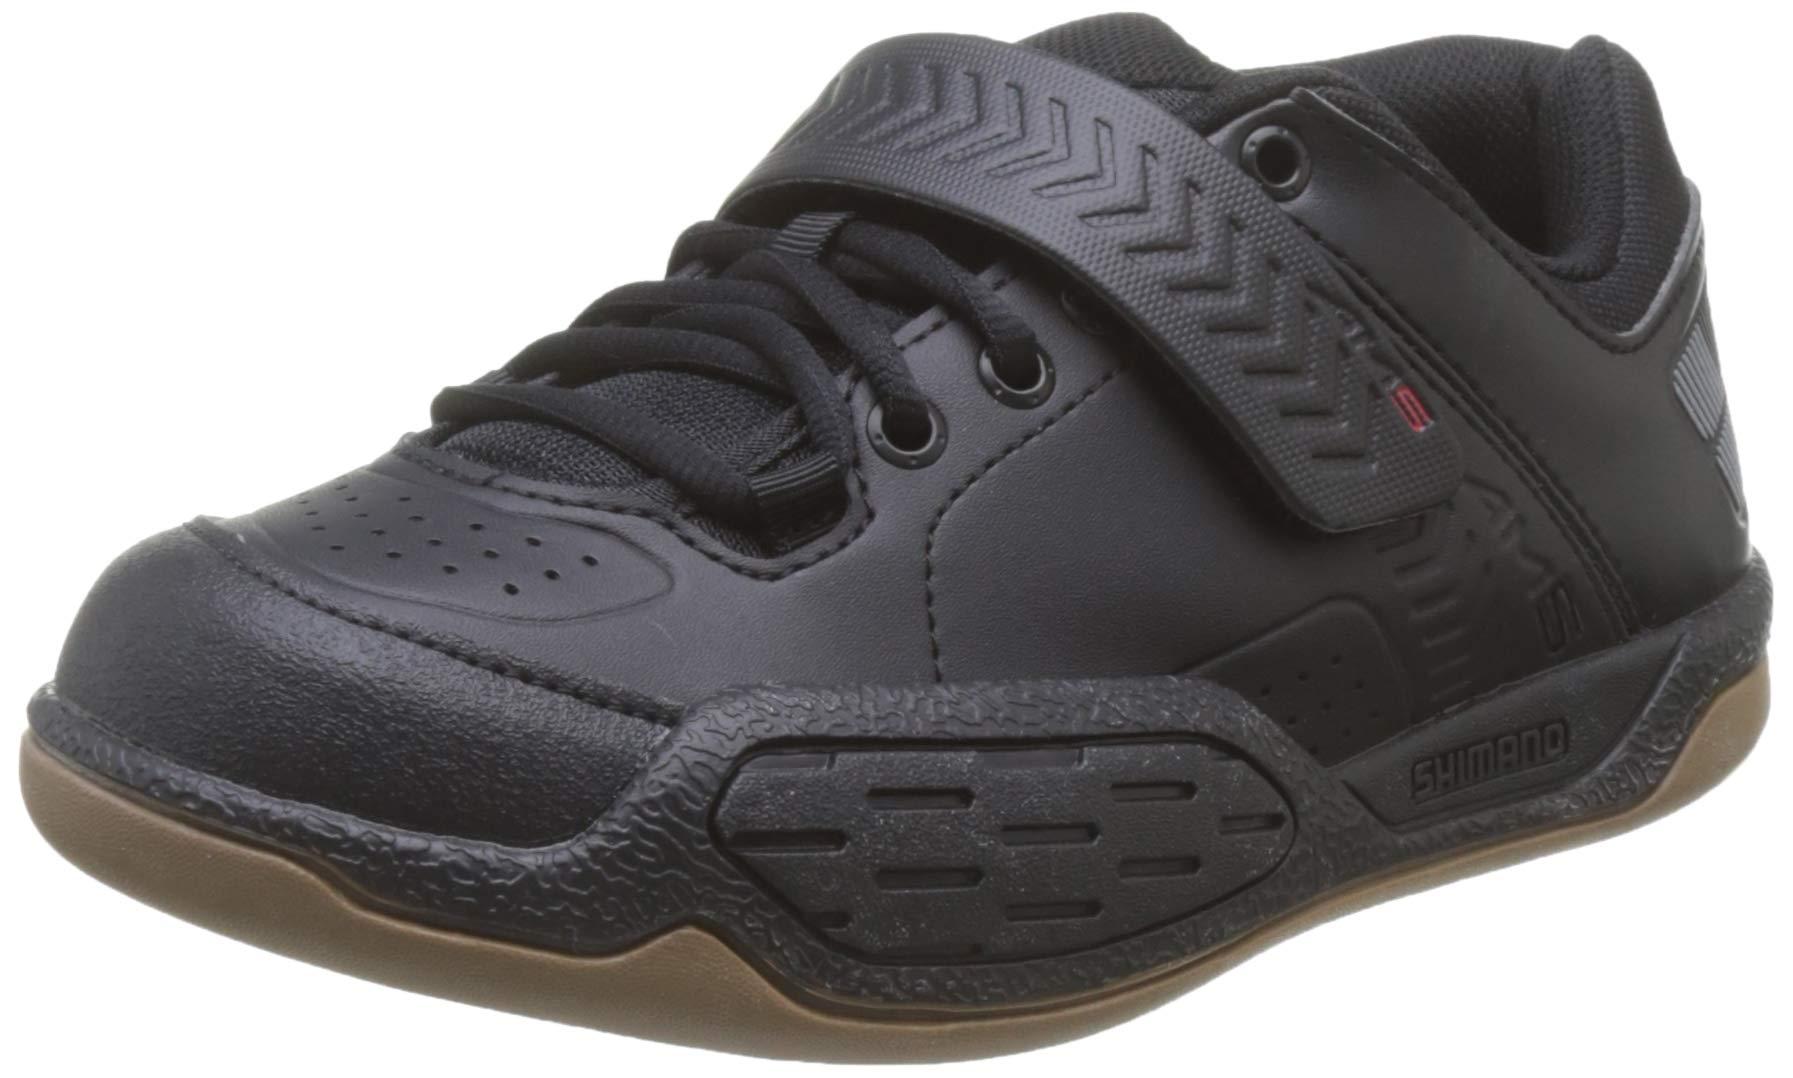 2015 Shimano Mens AM5 SPD Trail / Leisure Shoes Black UK 2.7 / US 3.7 / EU 36